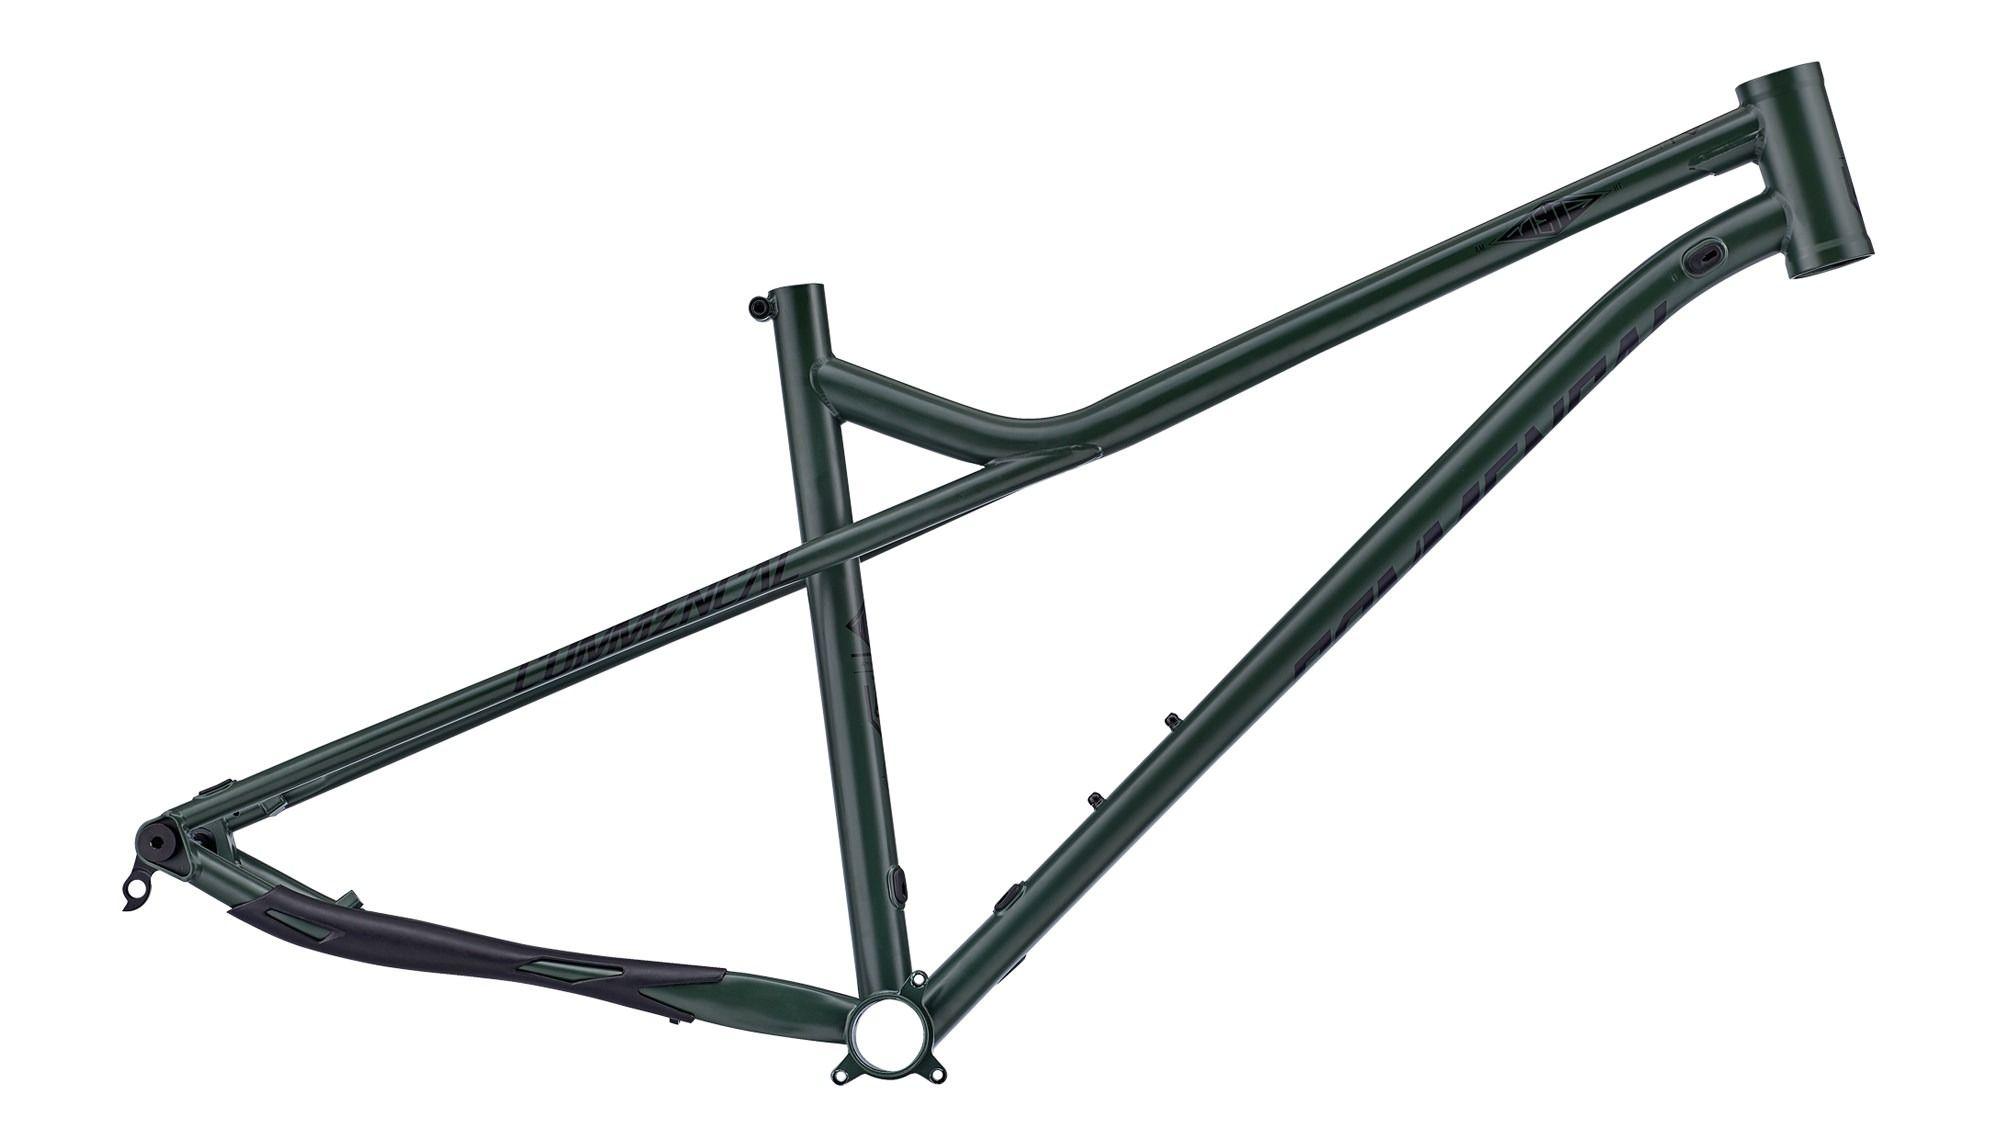 Cuadro de Mountain Bike COMMENCAL META HT AM CrMo 650B GREEN 2018 ...